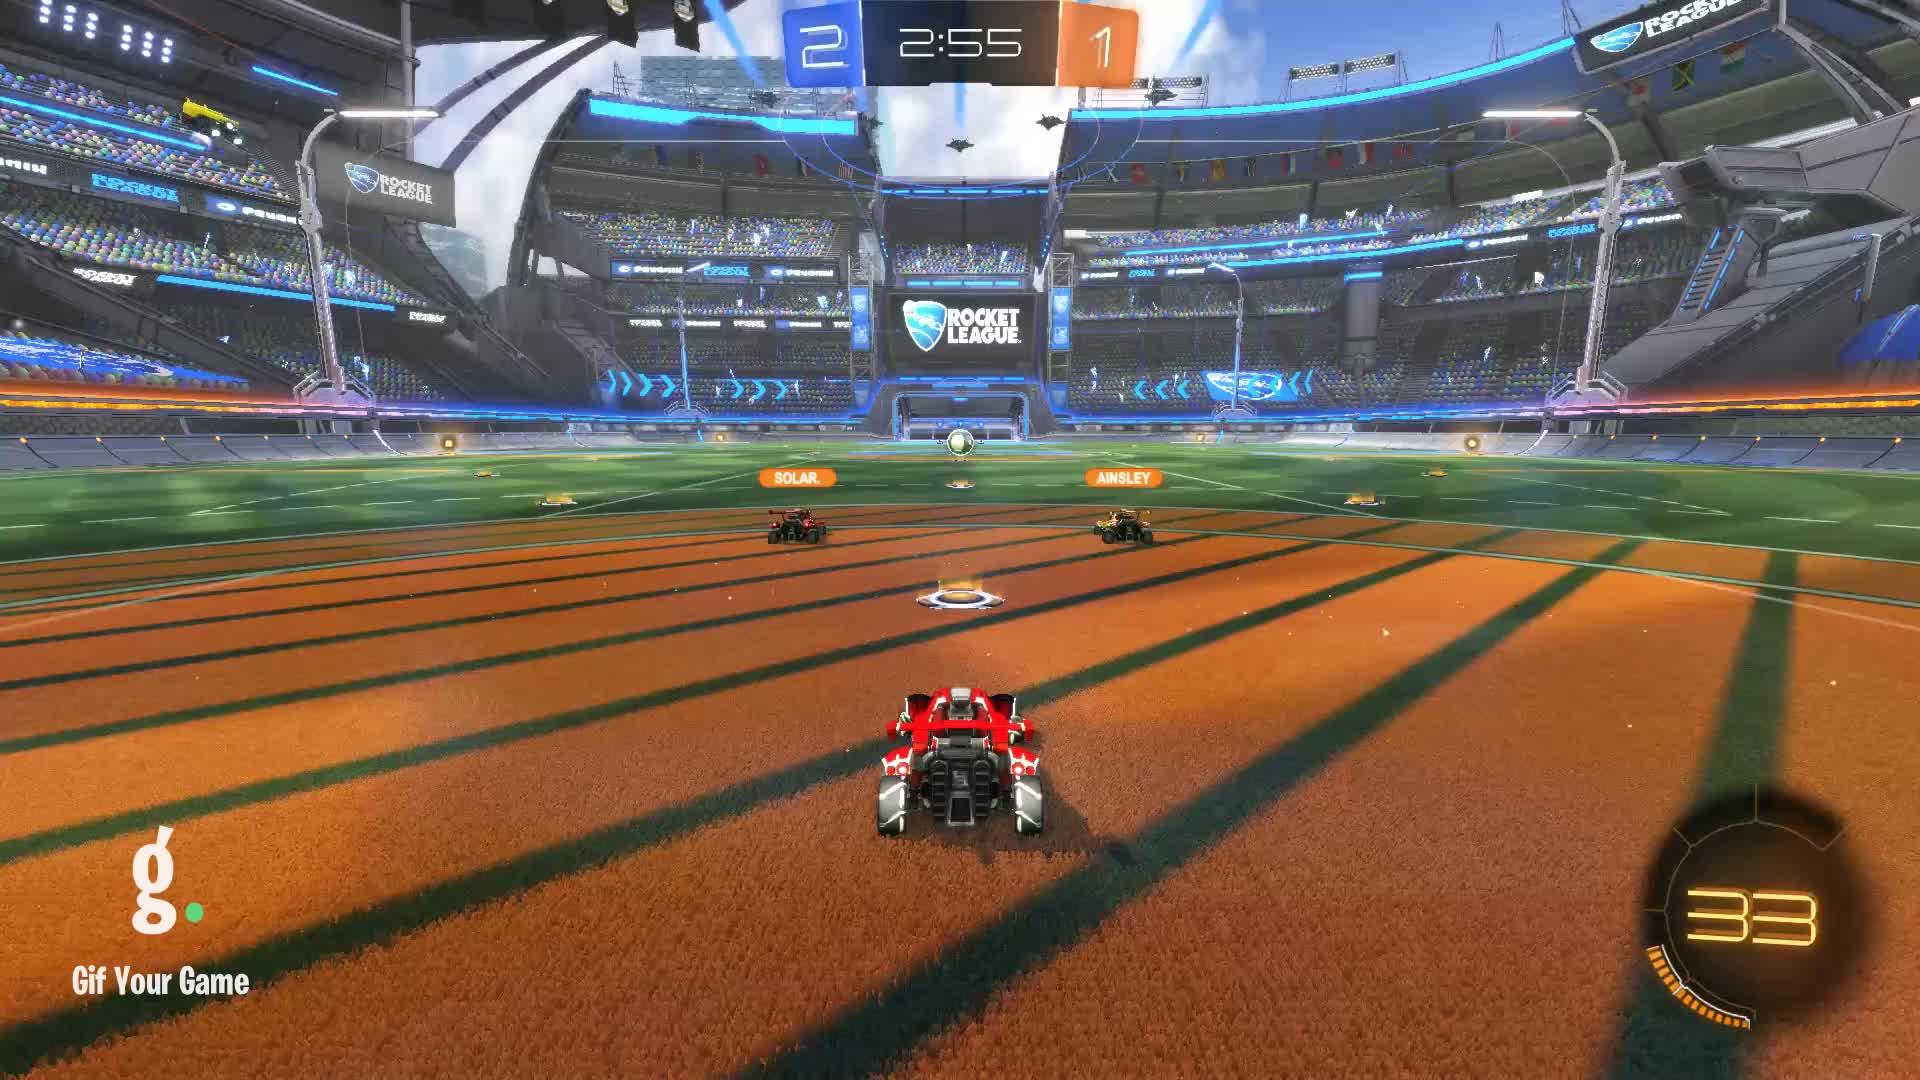 Gif Your Game, GifYourGame, Goal, MjSwartz, Rocket League, RocketLeague, Goal 4: MjSwartz GIFs